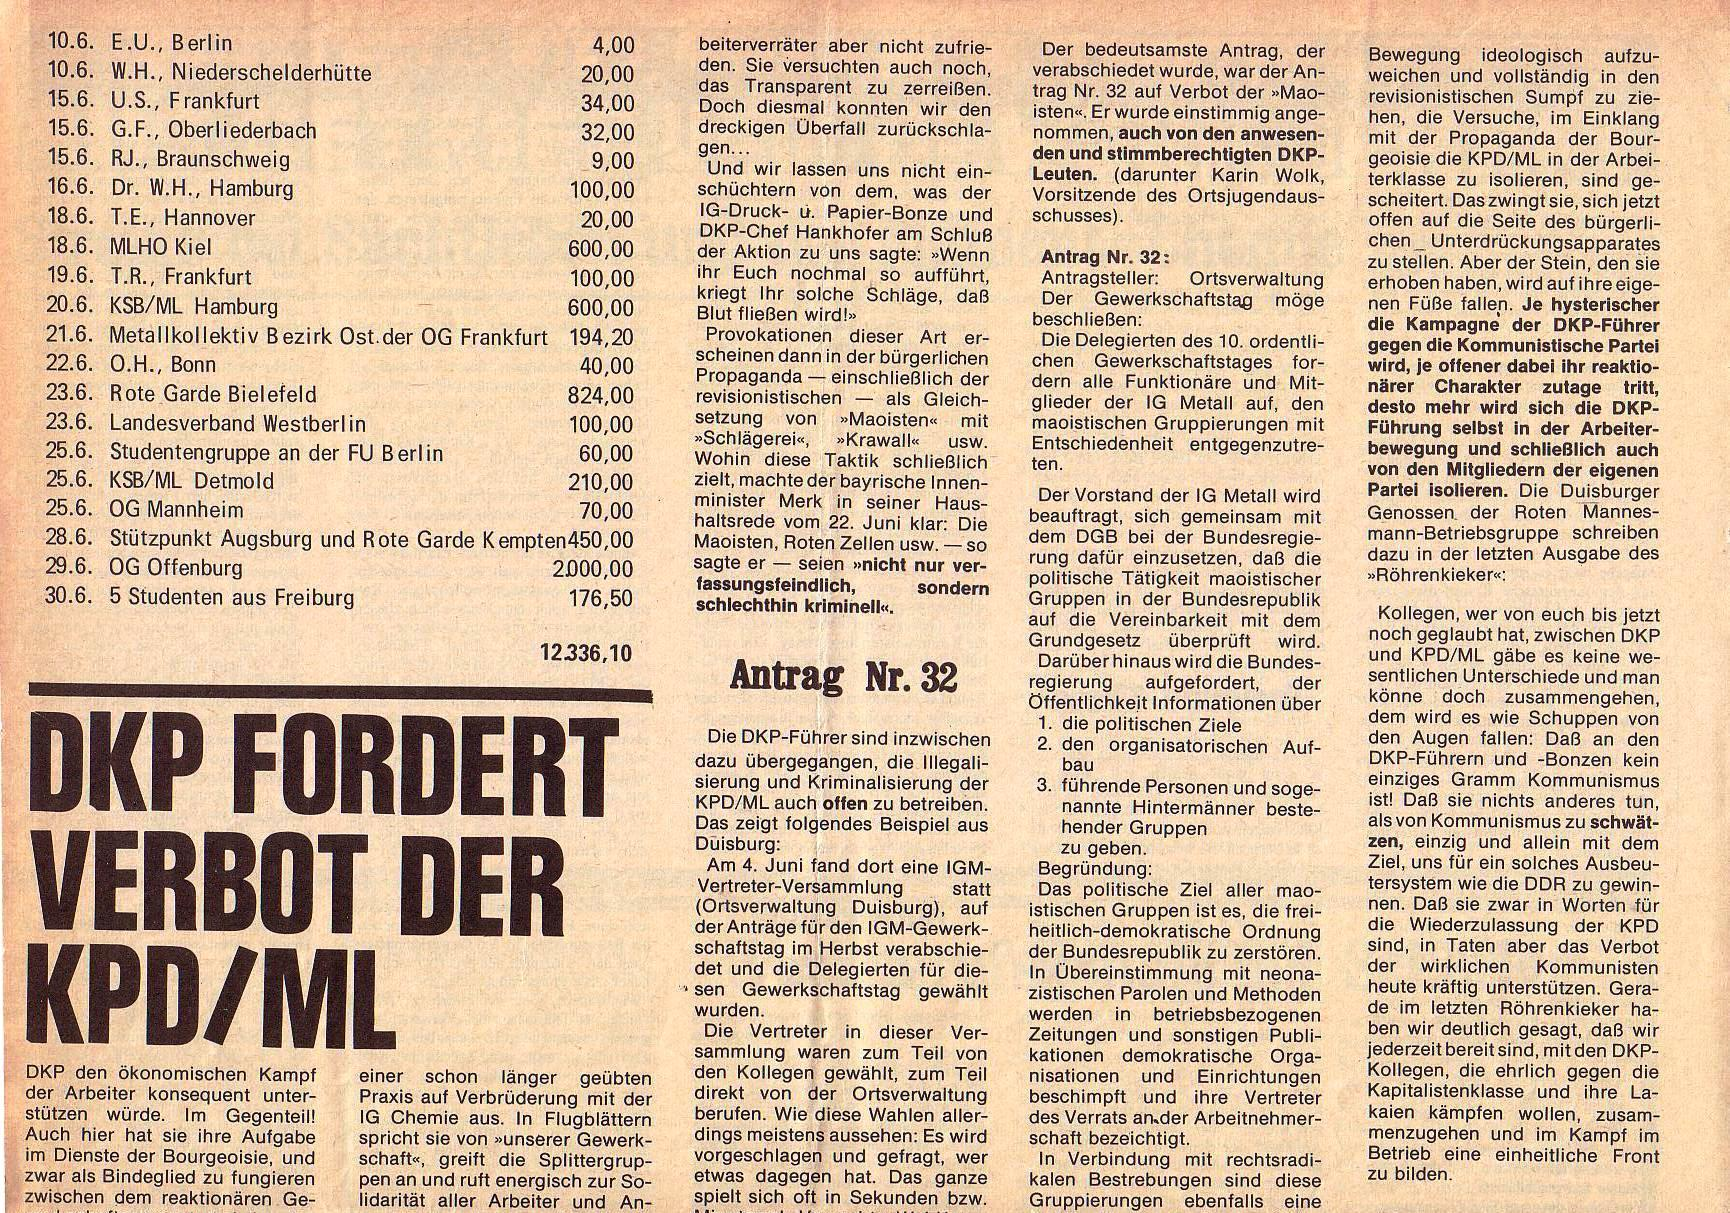 Roter Morgen, 5. Jg., Juli 1971, Nr. 7, Seite 6a